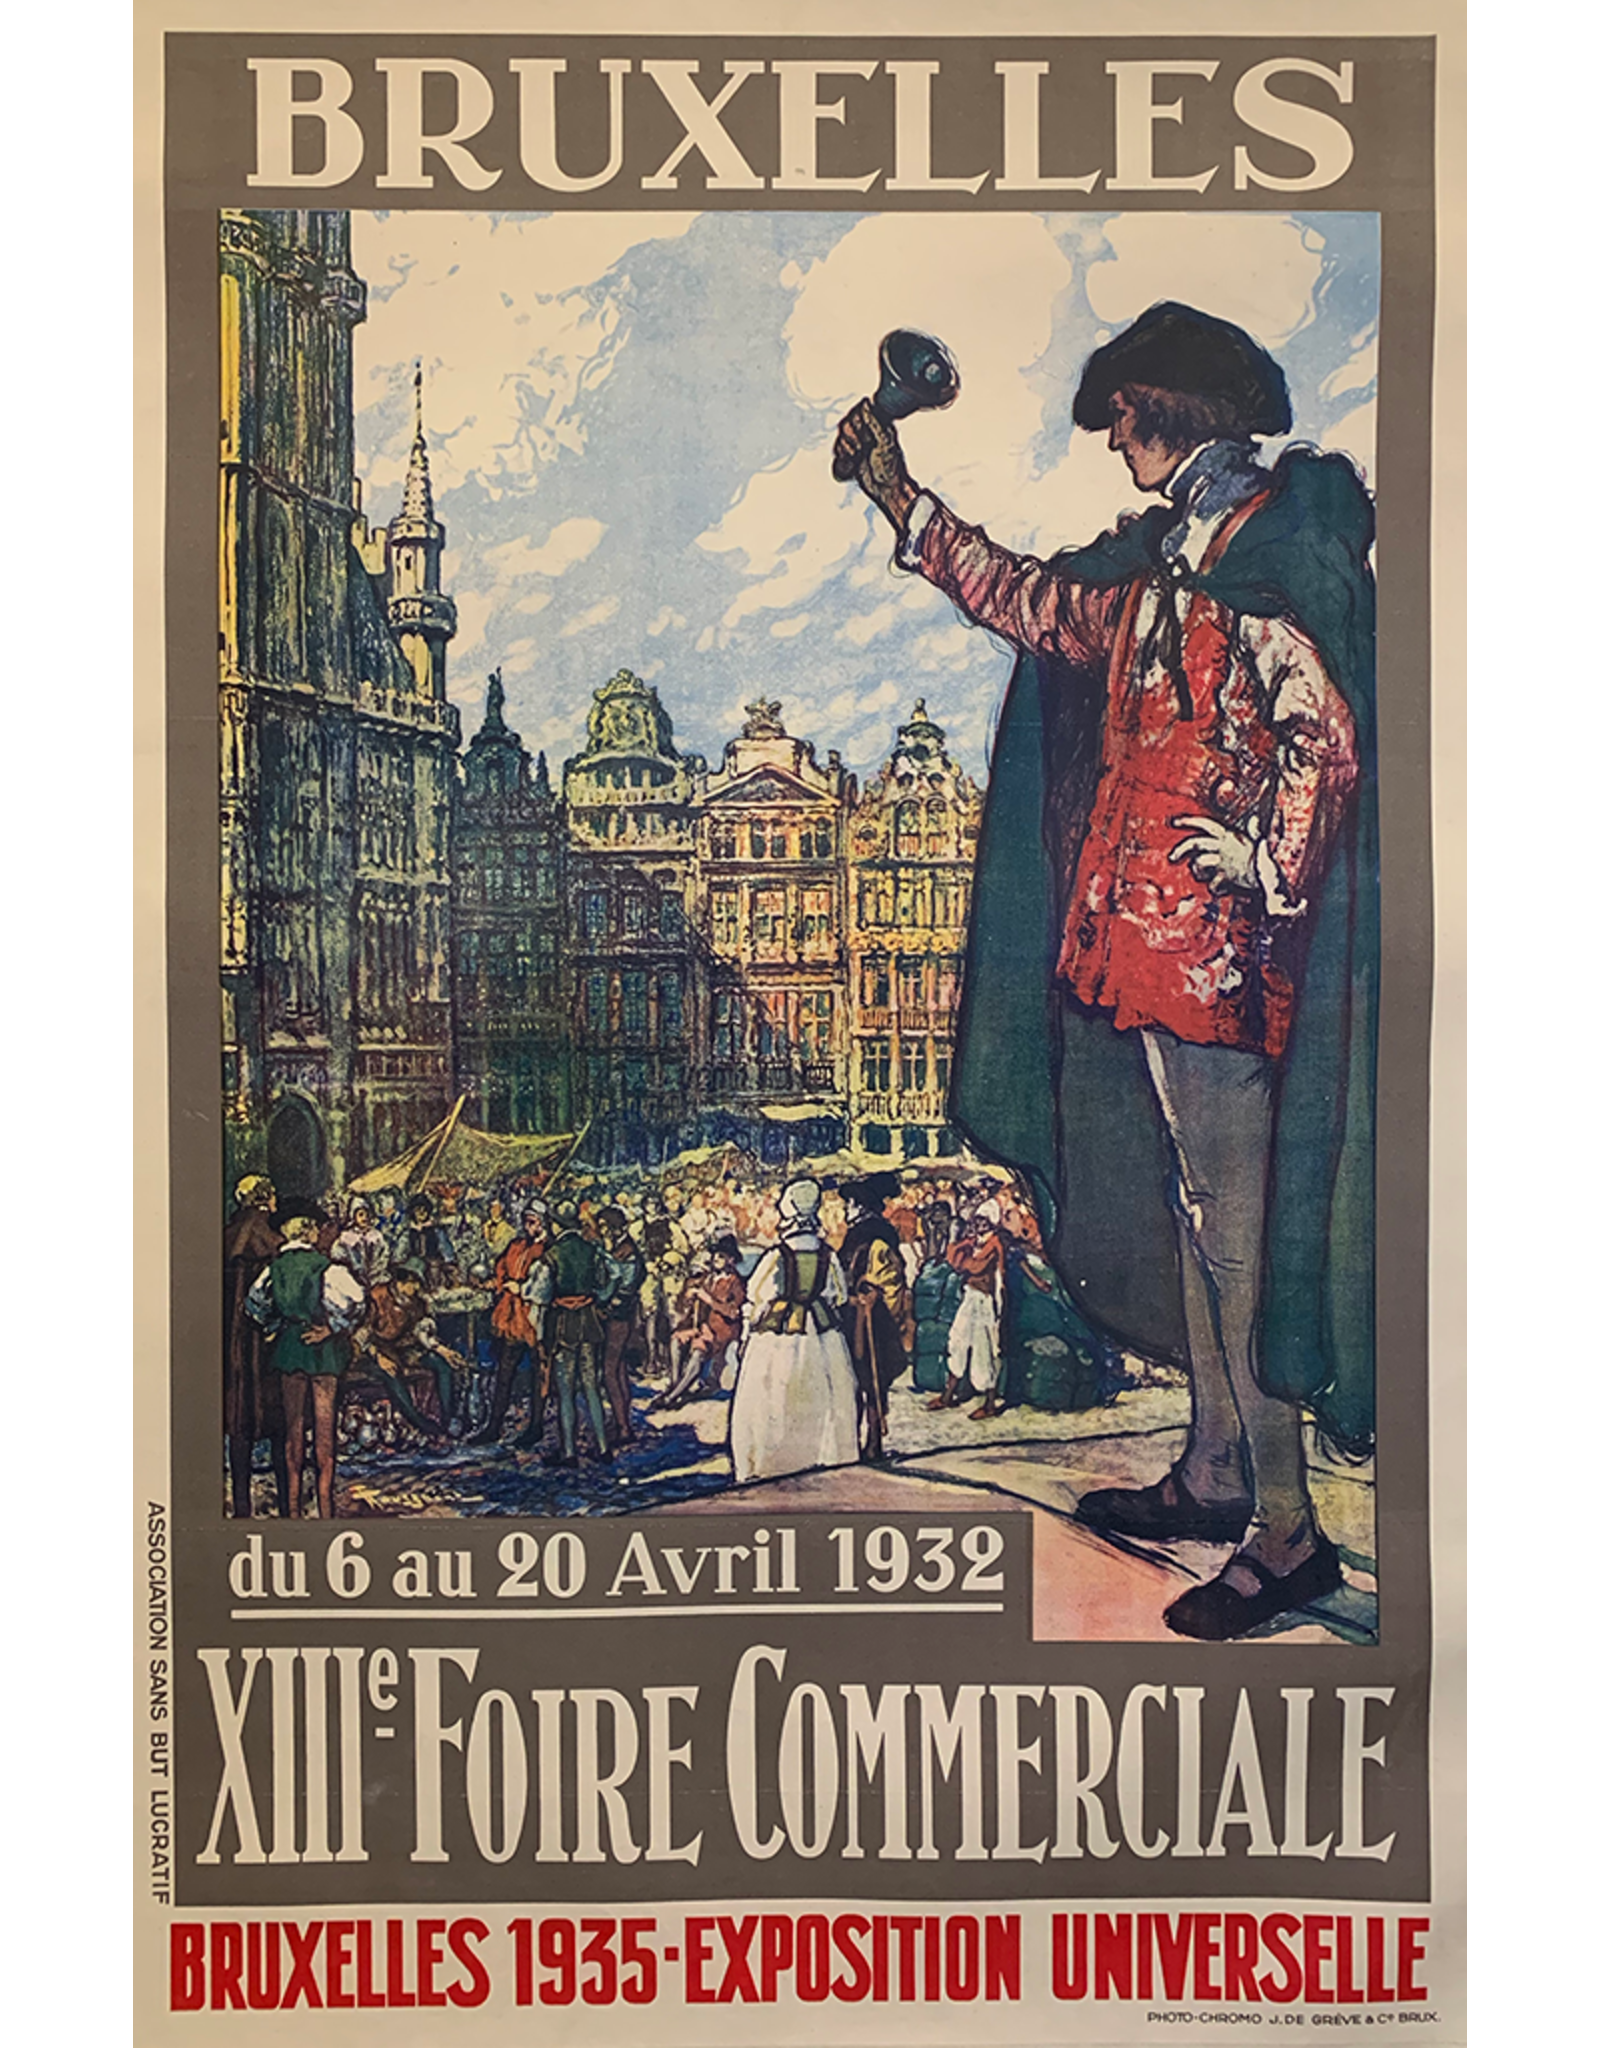 SPV Bruxells, XIII Foire Commerciale